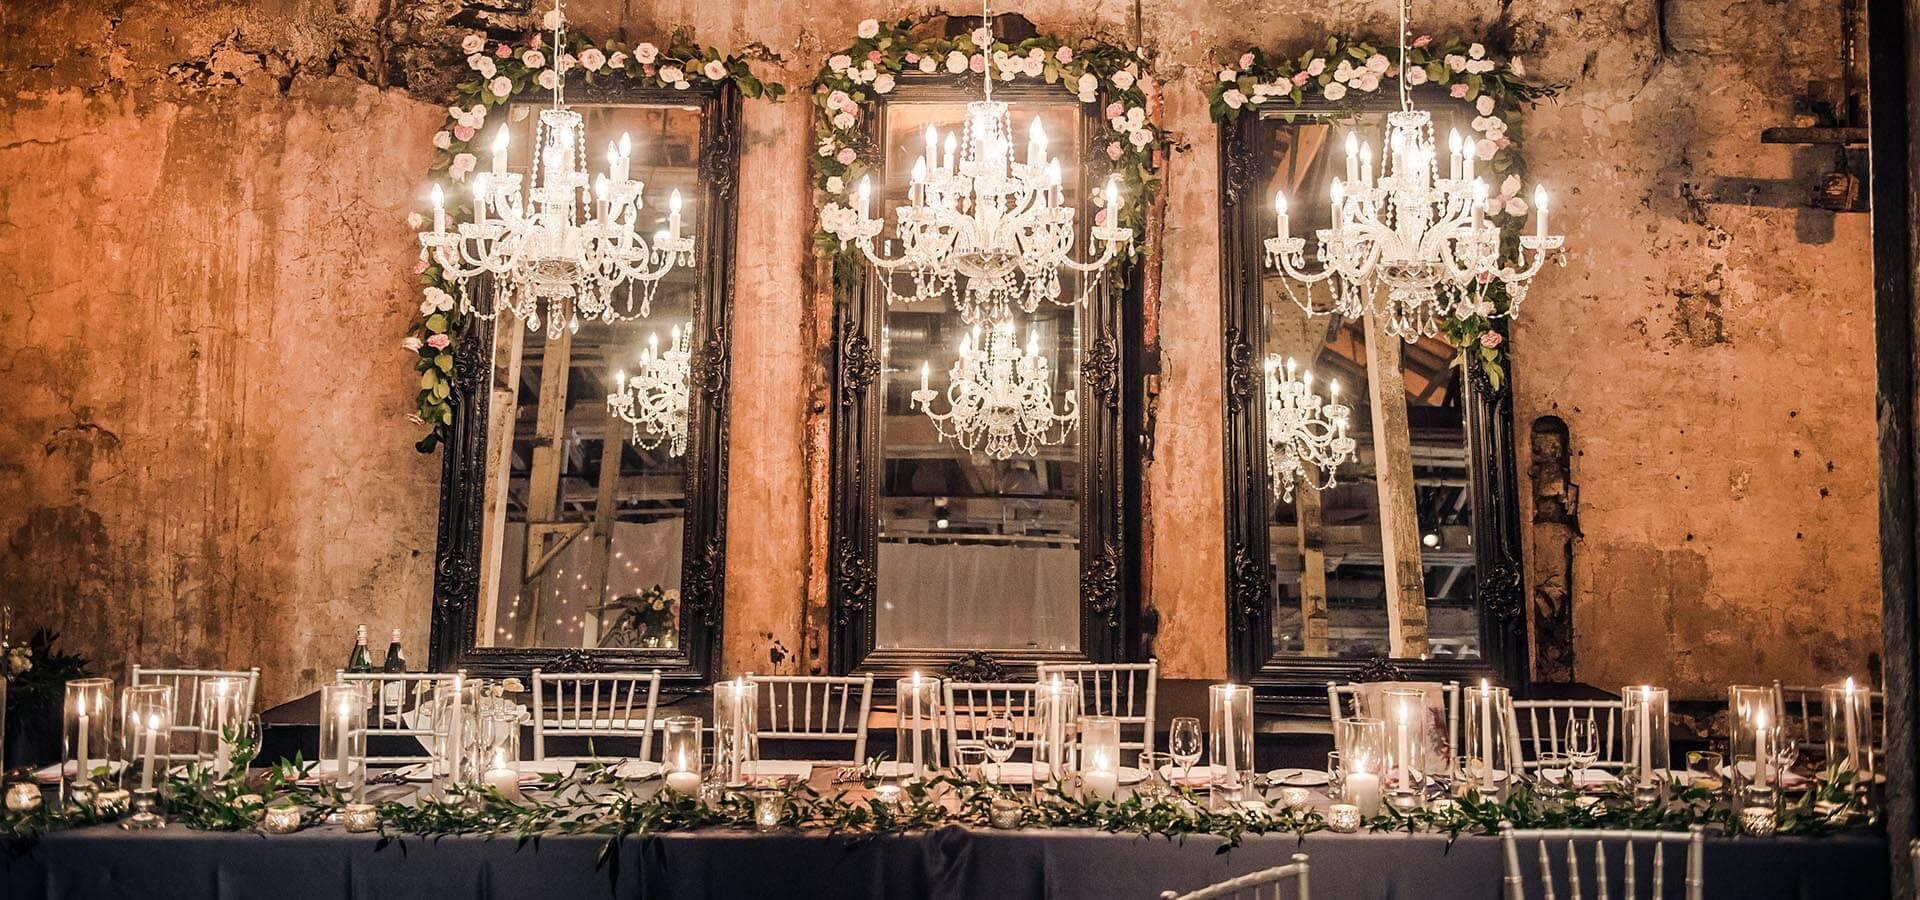 & Christina and Brandonu0027s Ultra Romantic Wedding at the Fermenting Cellar